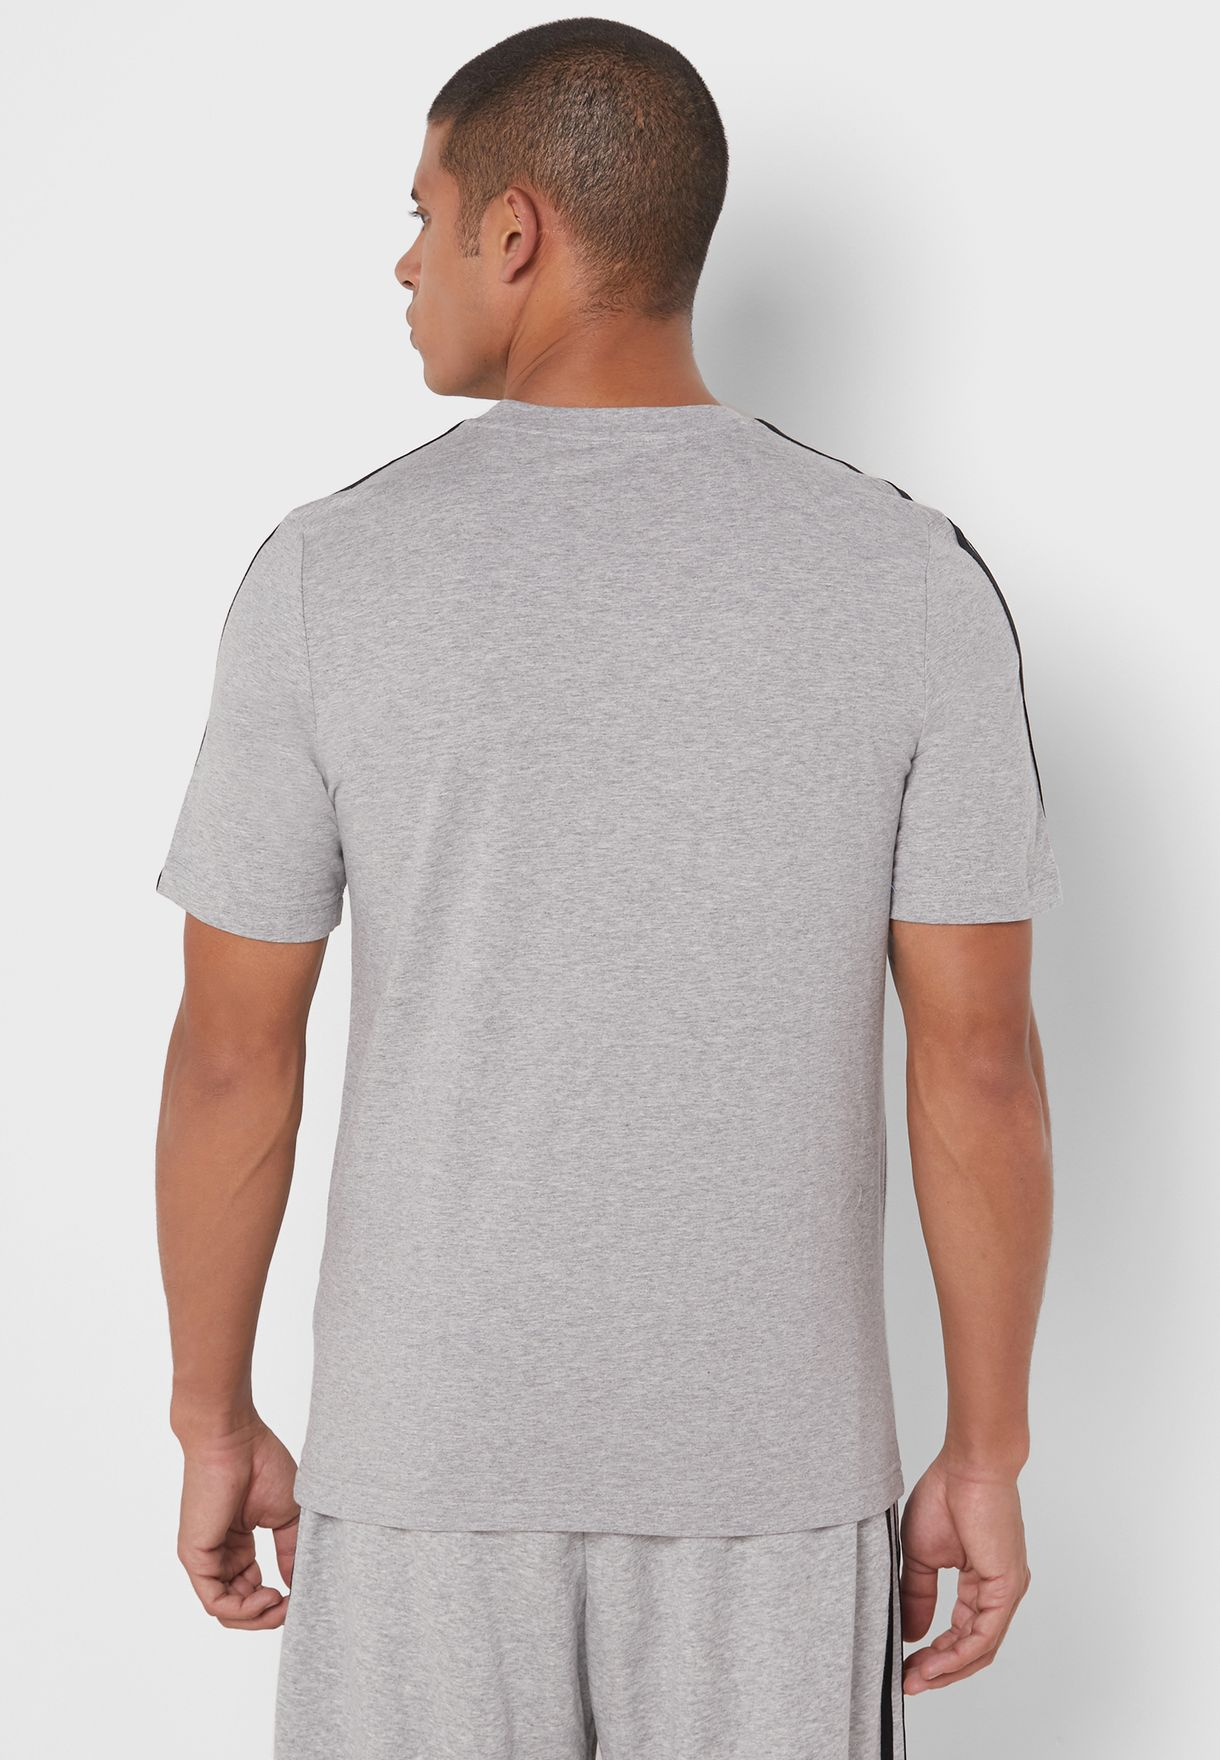 3 Stripe Essential T-Shirt